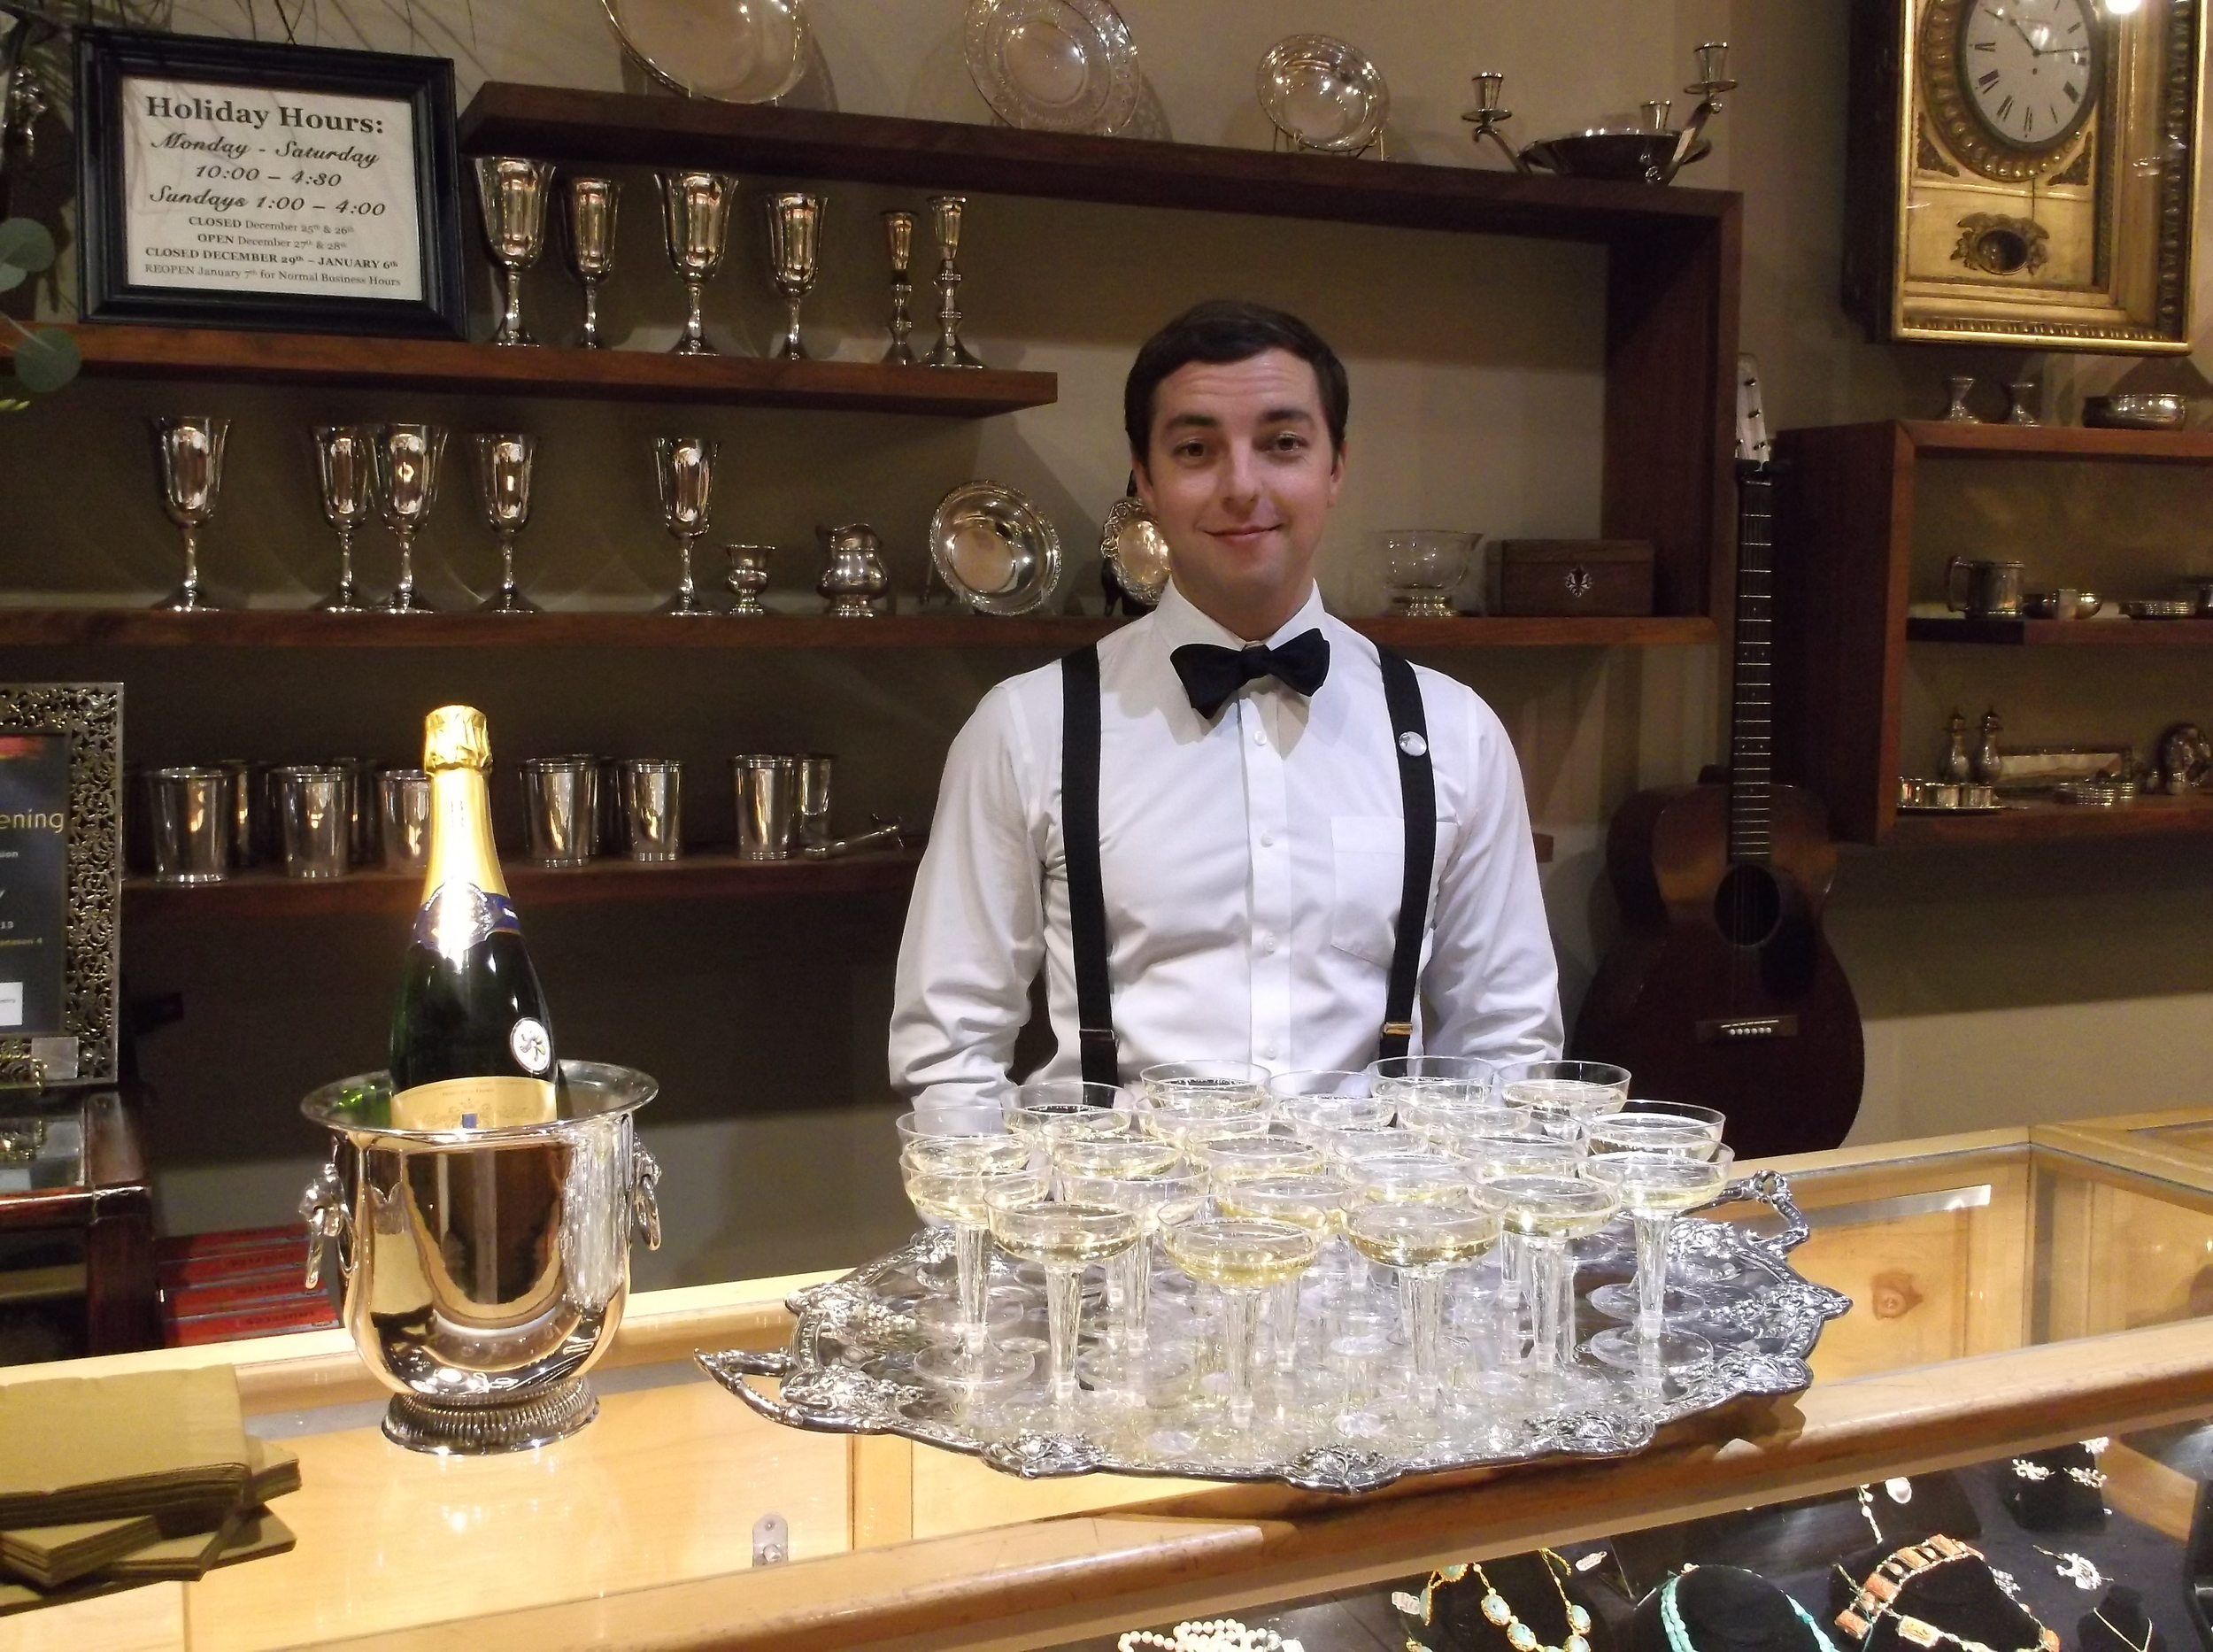 Pat Garland, resident bartender